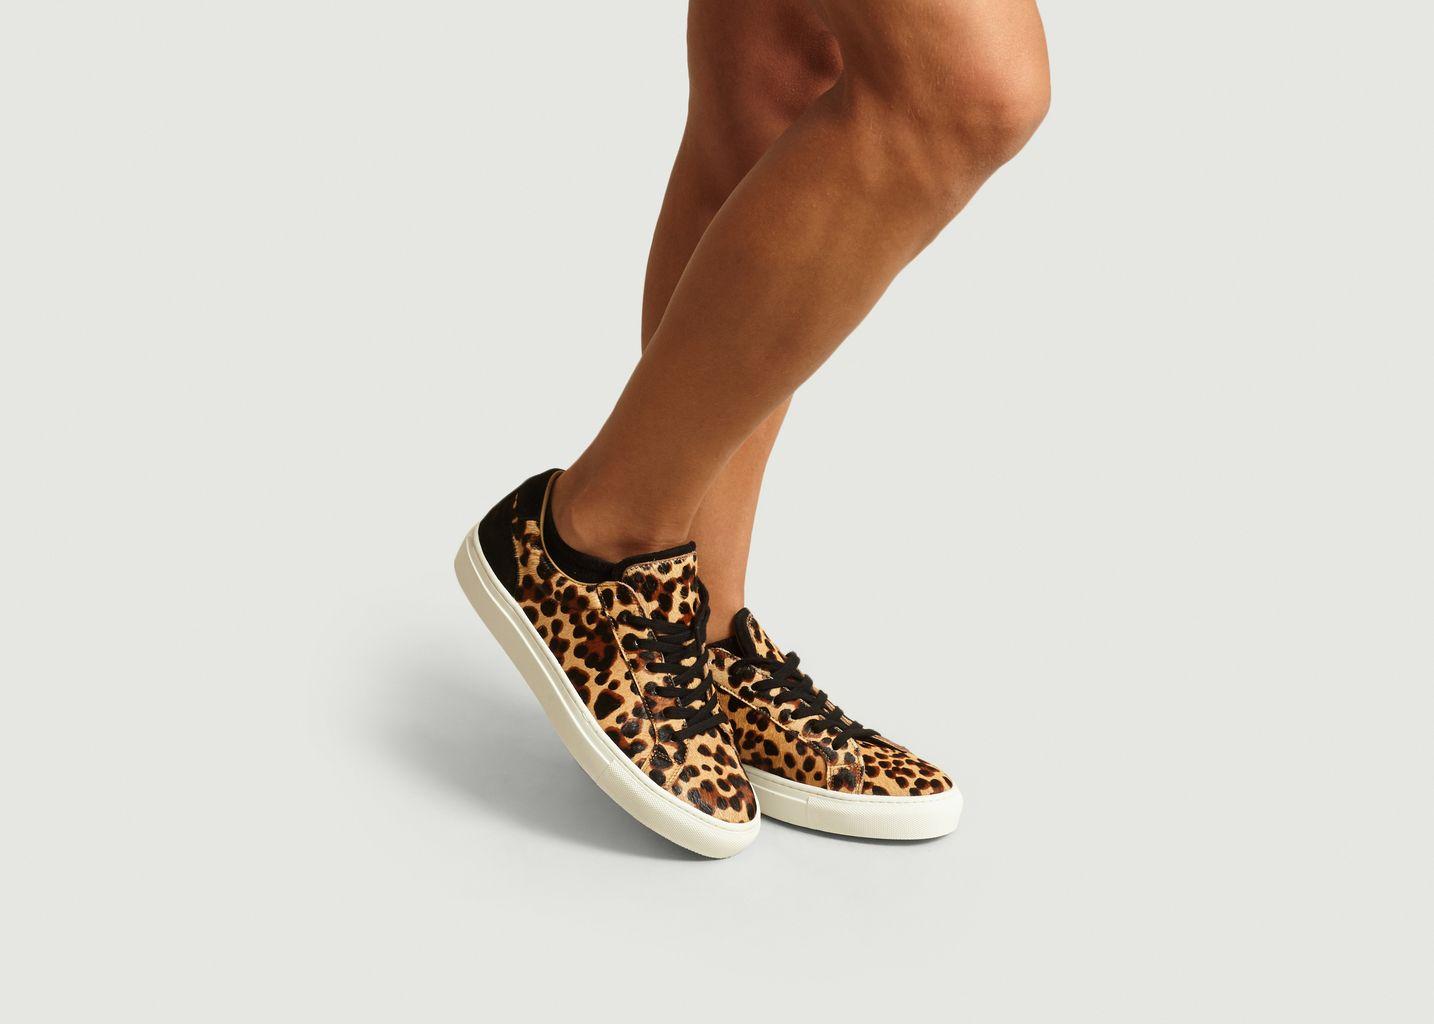 Sneakers Léopard Eugène - Canal Saint Martin